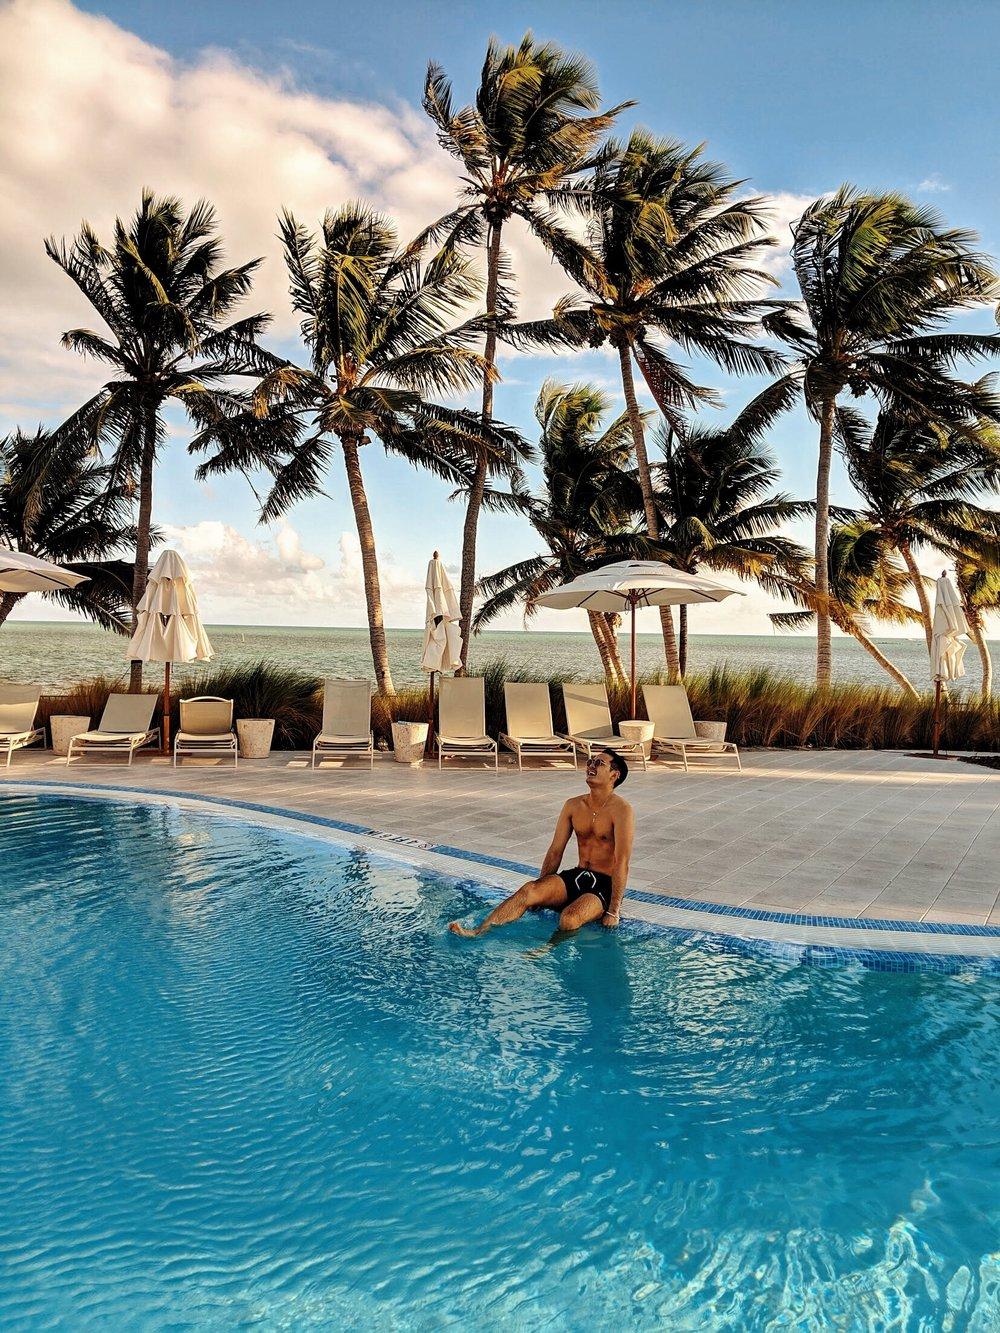 amara cay resort florida keys